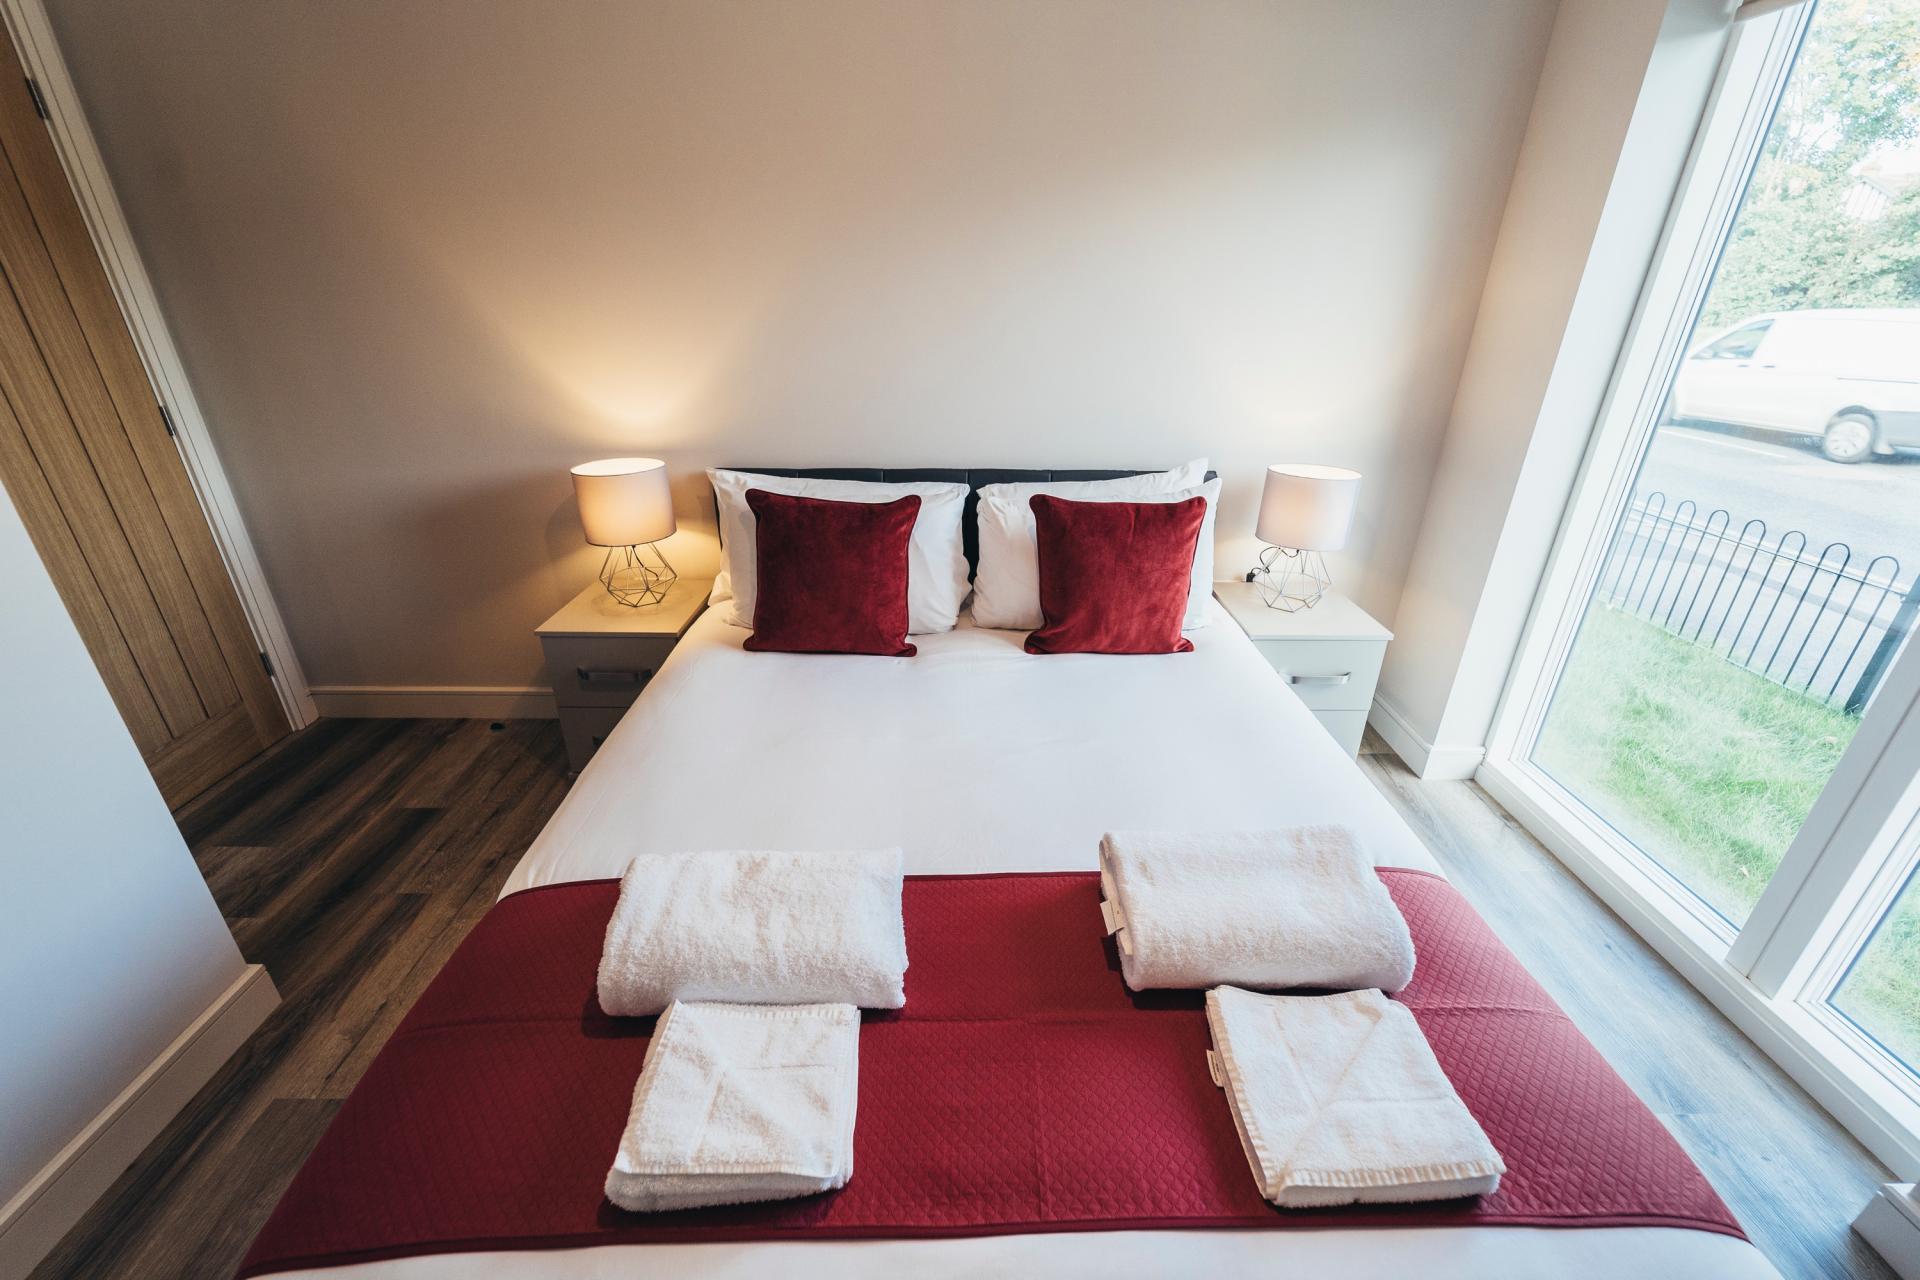 Bed at Devonshire Court Apartments, West Bridgford, Nottingham